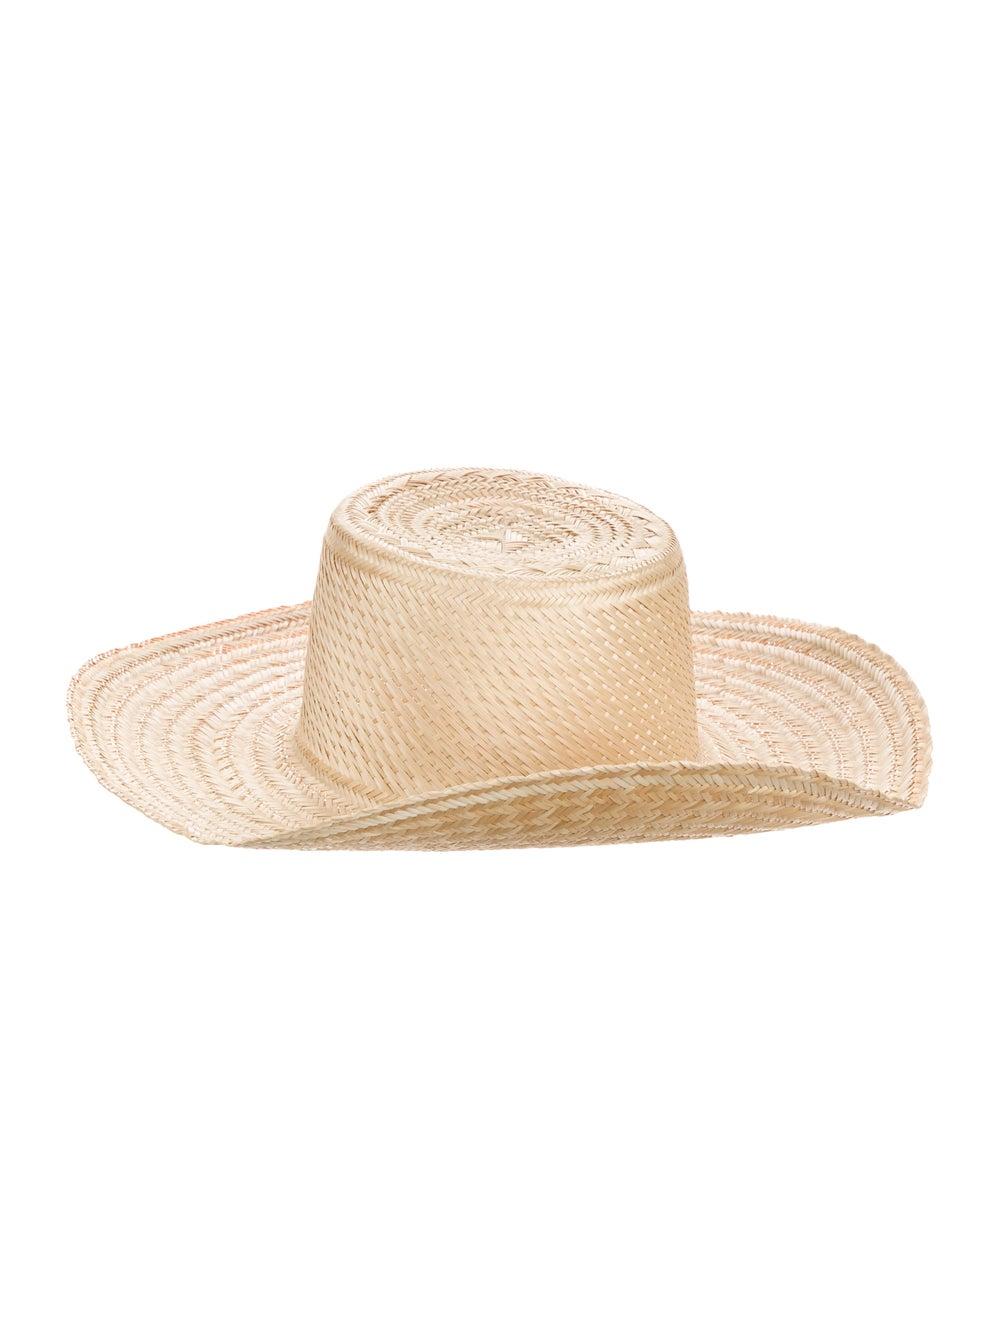 Janessa Leone Straw Hat Tan - image 2